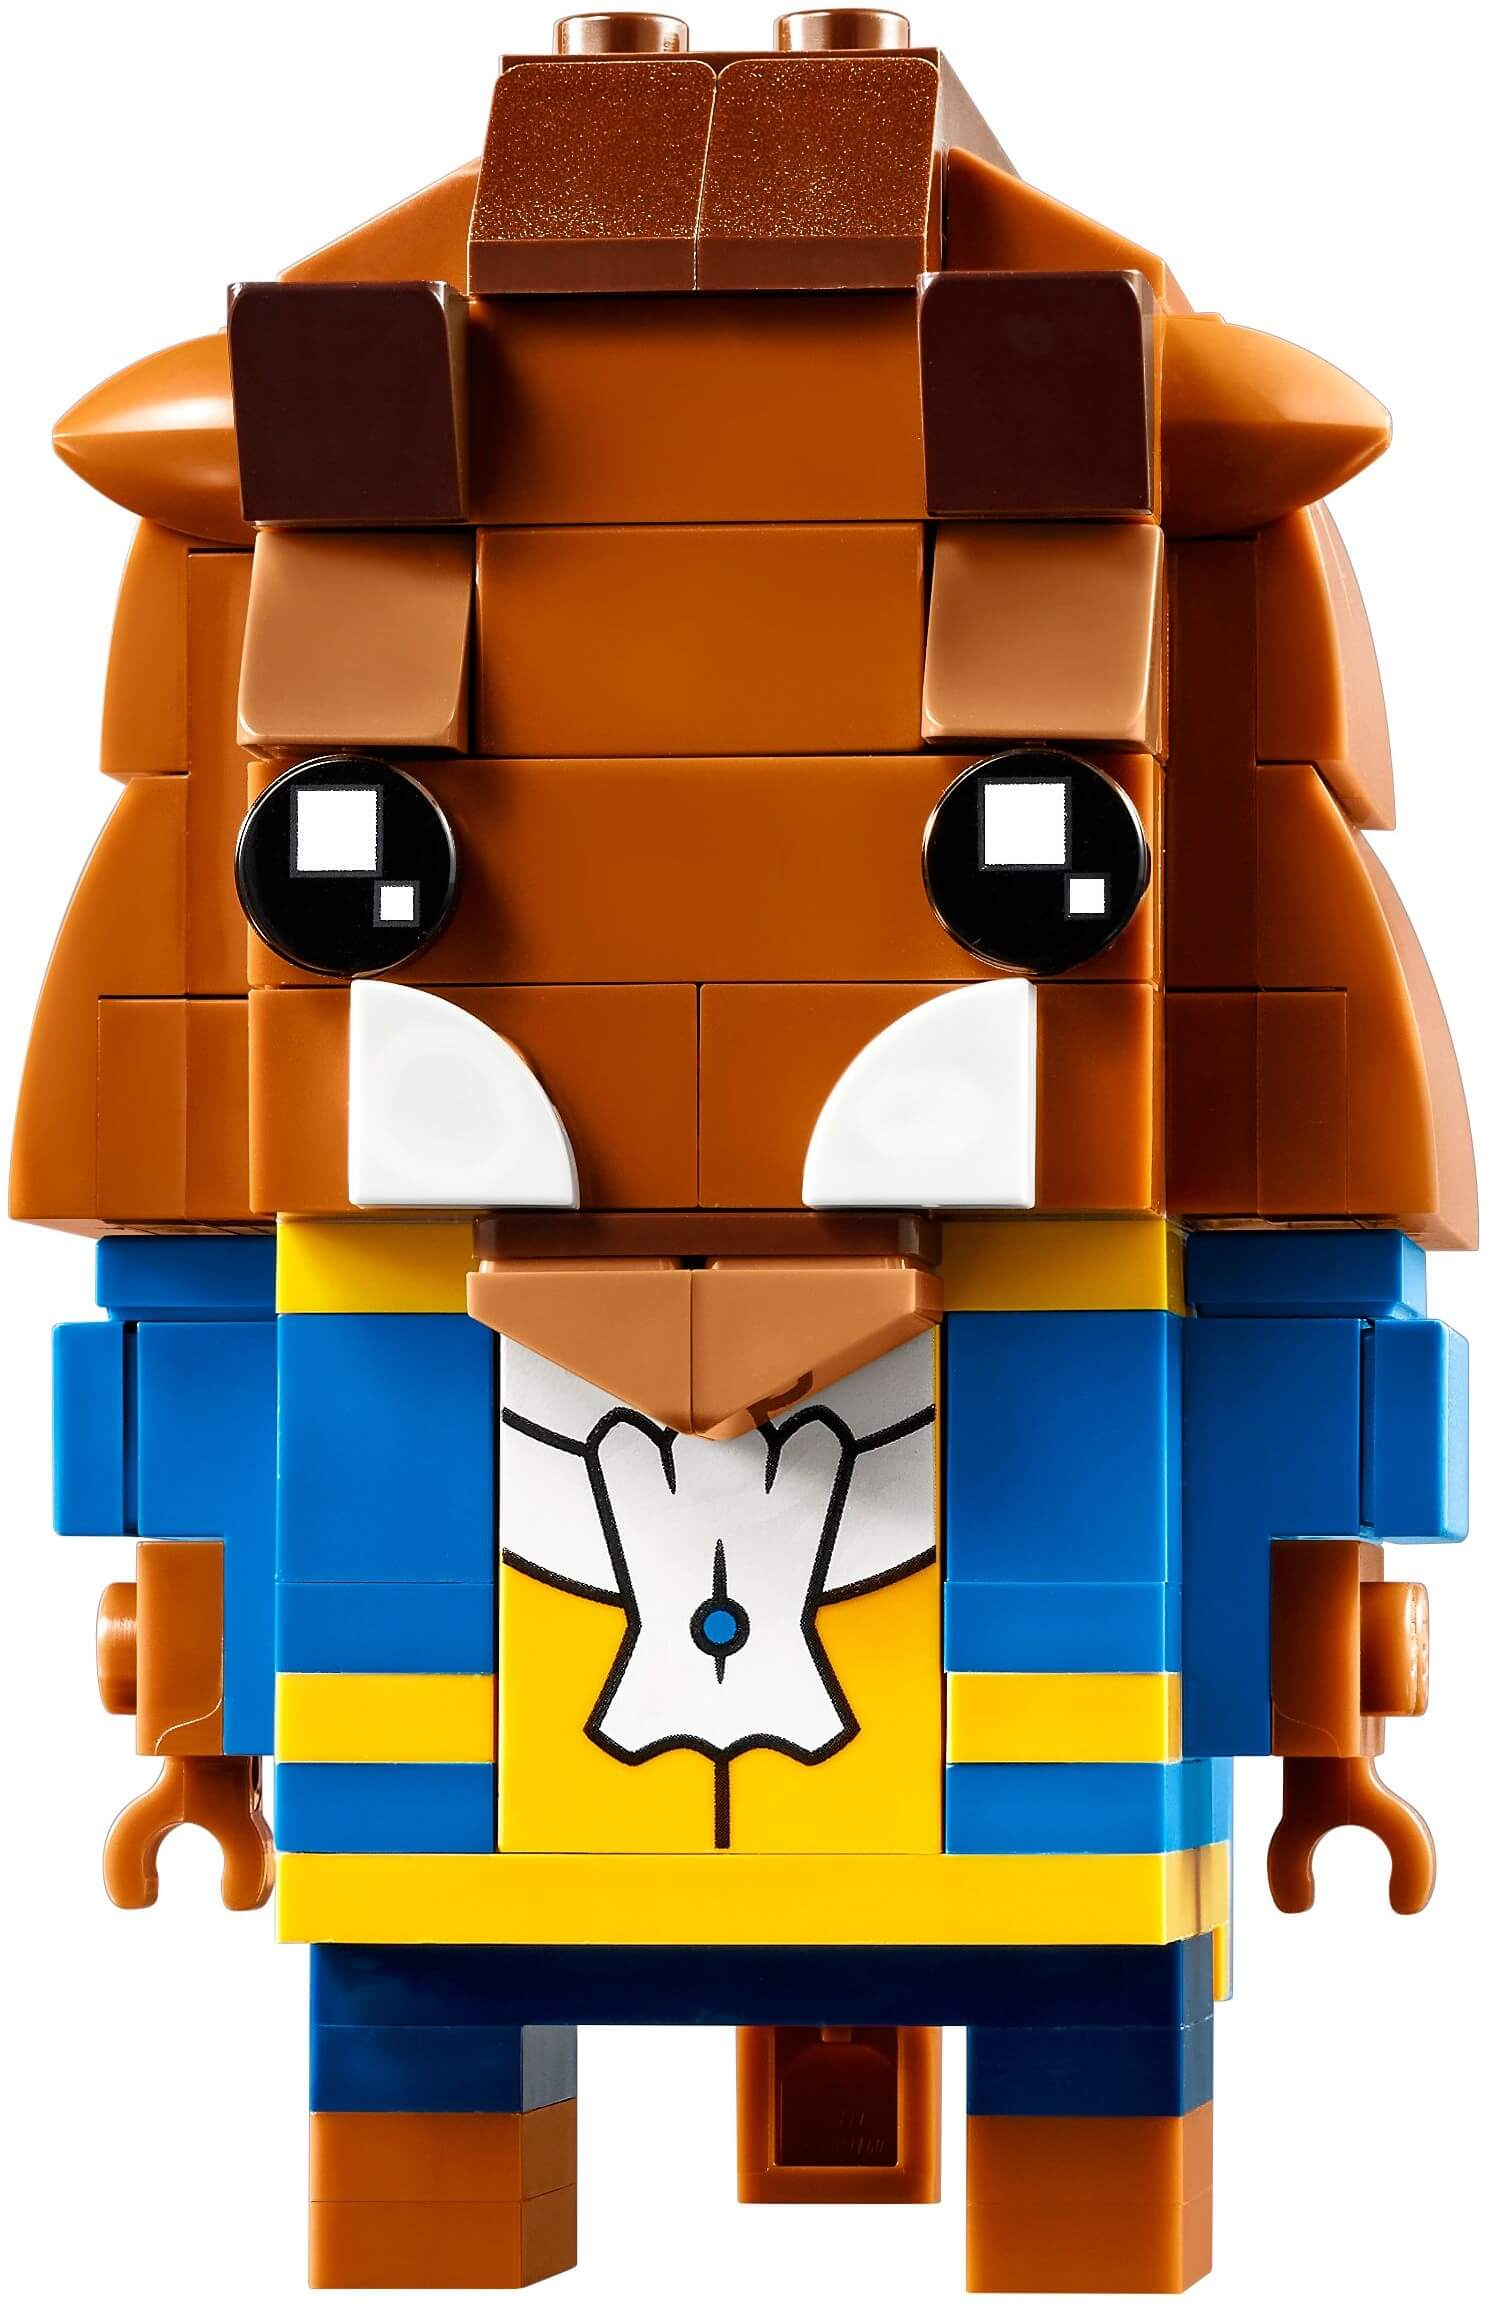 Mua đồ chơi LEGO 41596 - LEGO 41596 - Beast (LEGO Công Chúa Disney Princess 41596 - Beast)